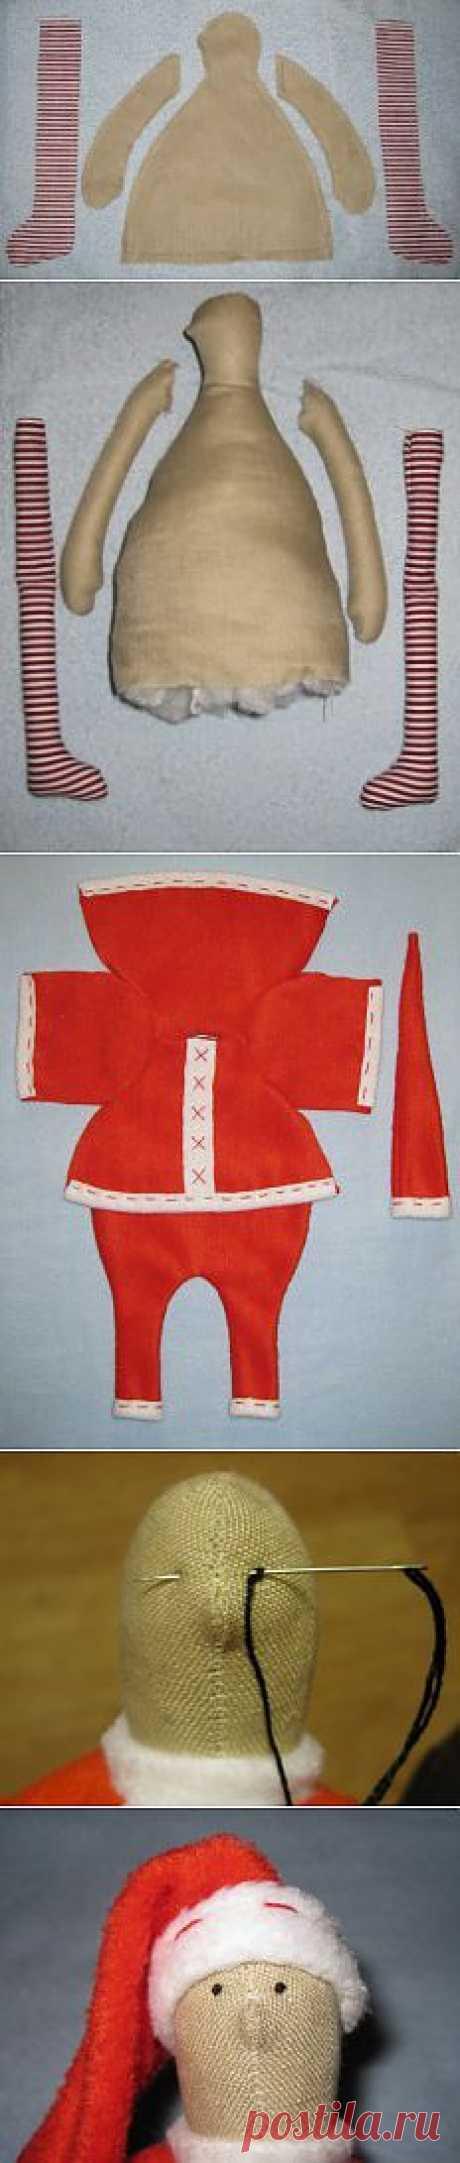 Дневник рукодельницы » Blog Archive » Дед Мороз (Тильда)